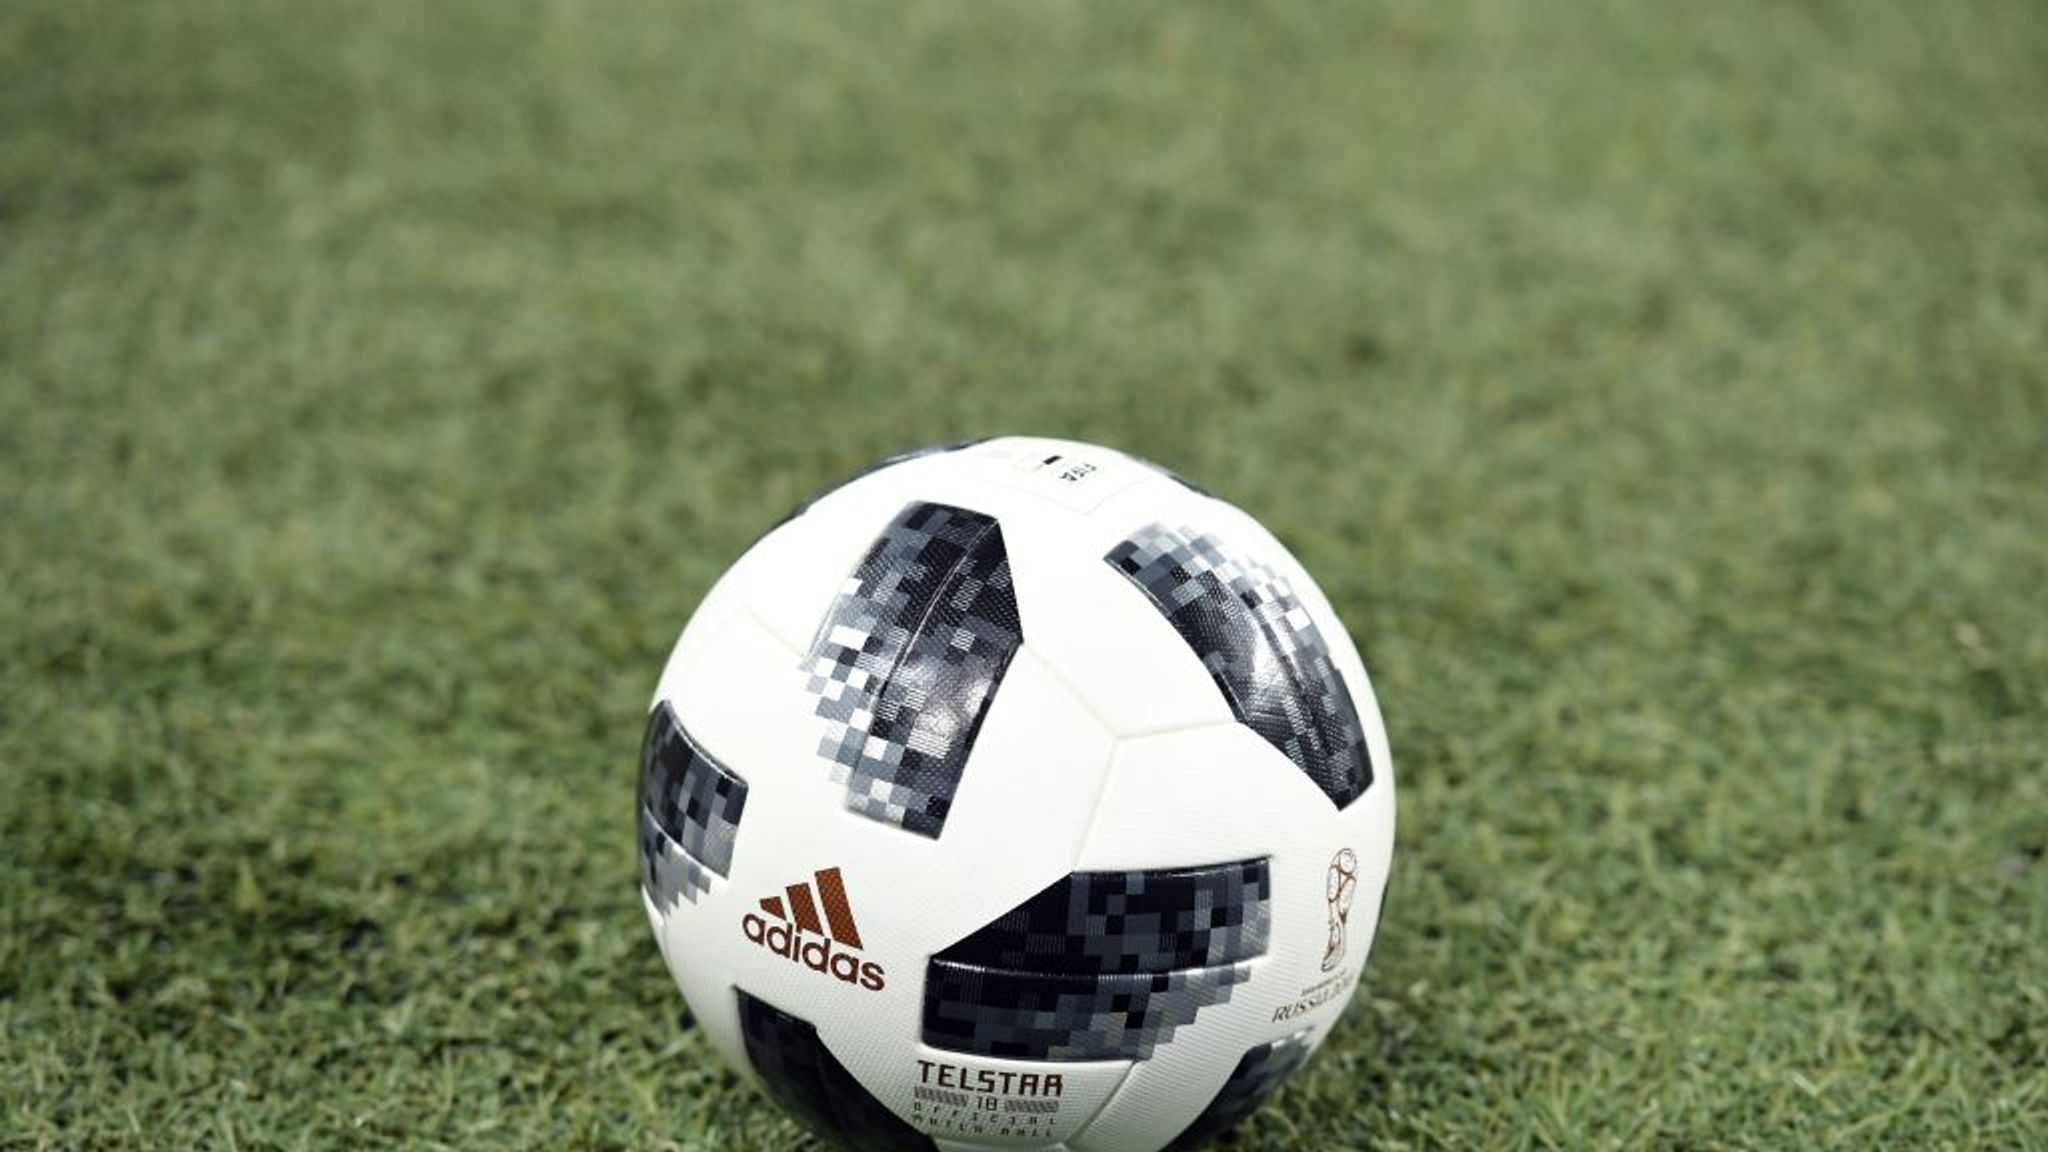 Police investigating gun claim at non-league football match